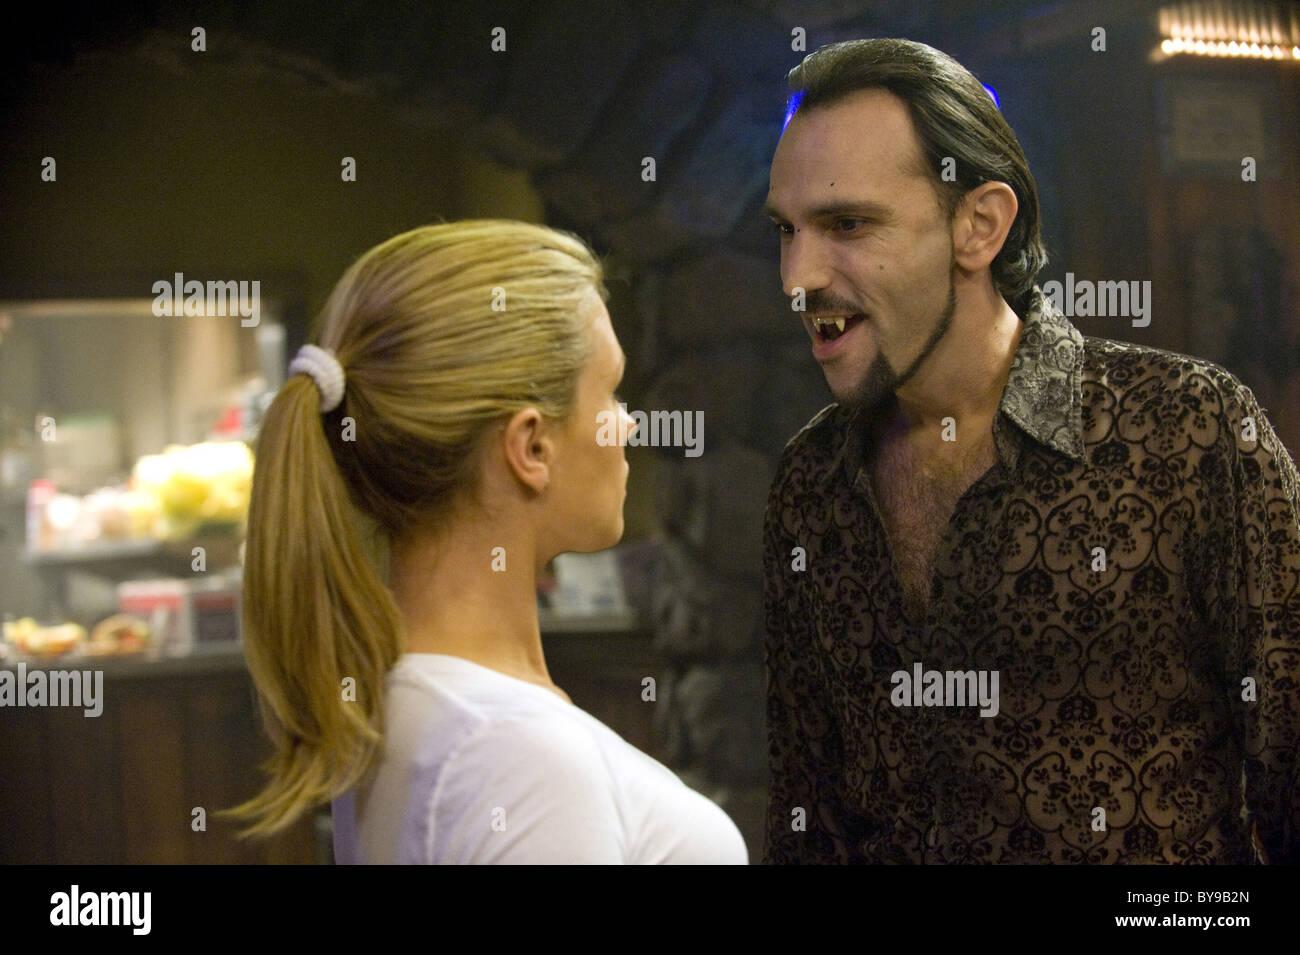 Blood True TV-Serie 2008 -??? USA in der Saison 2008 01 - Folge 07 brennende Haus der Liebe Regisseur Marcos Siega Stockbild